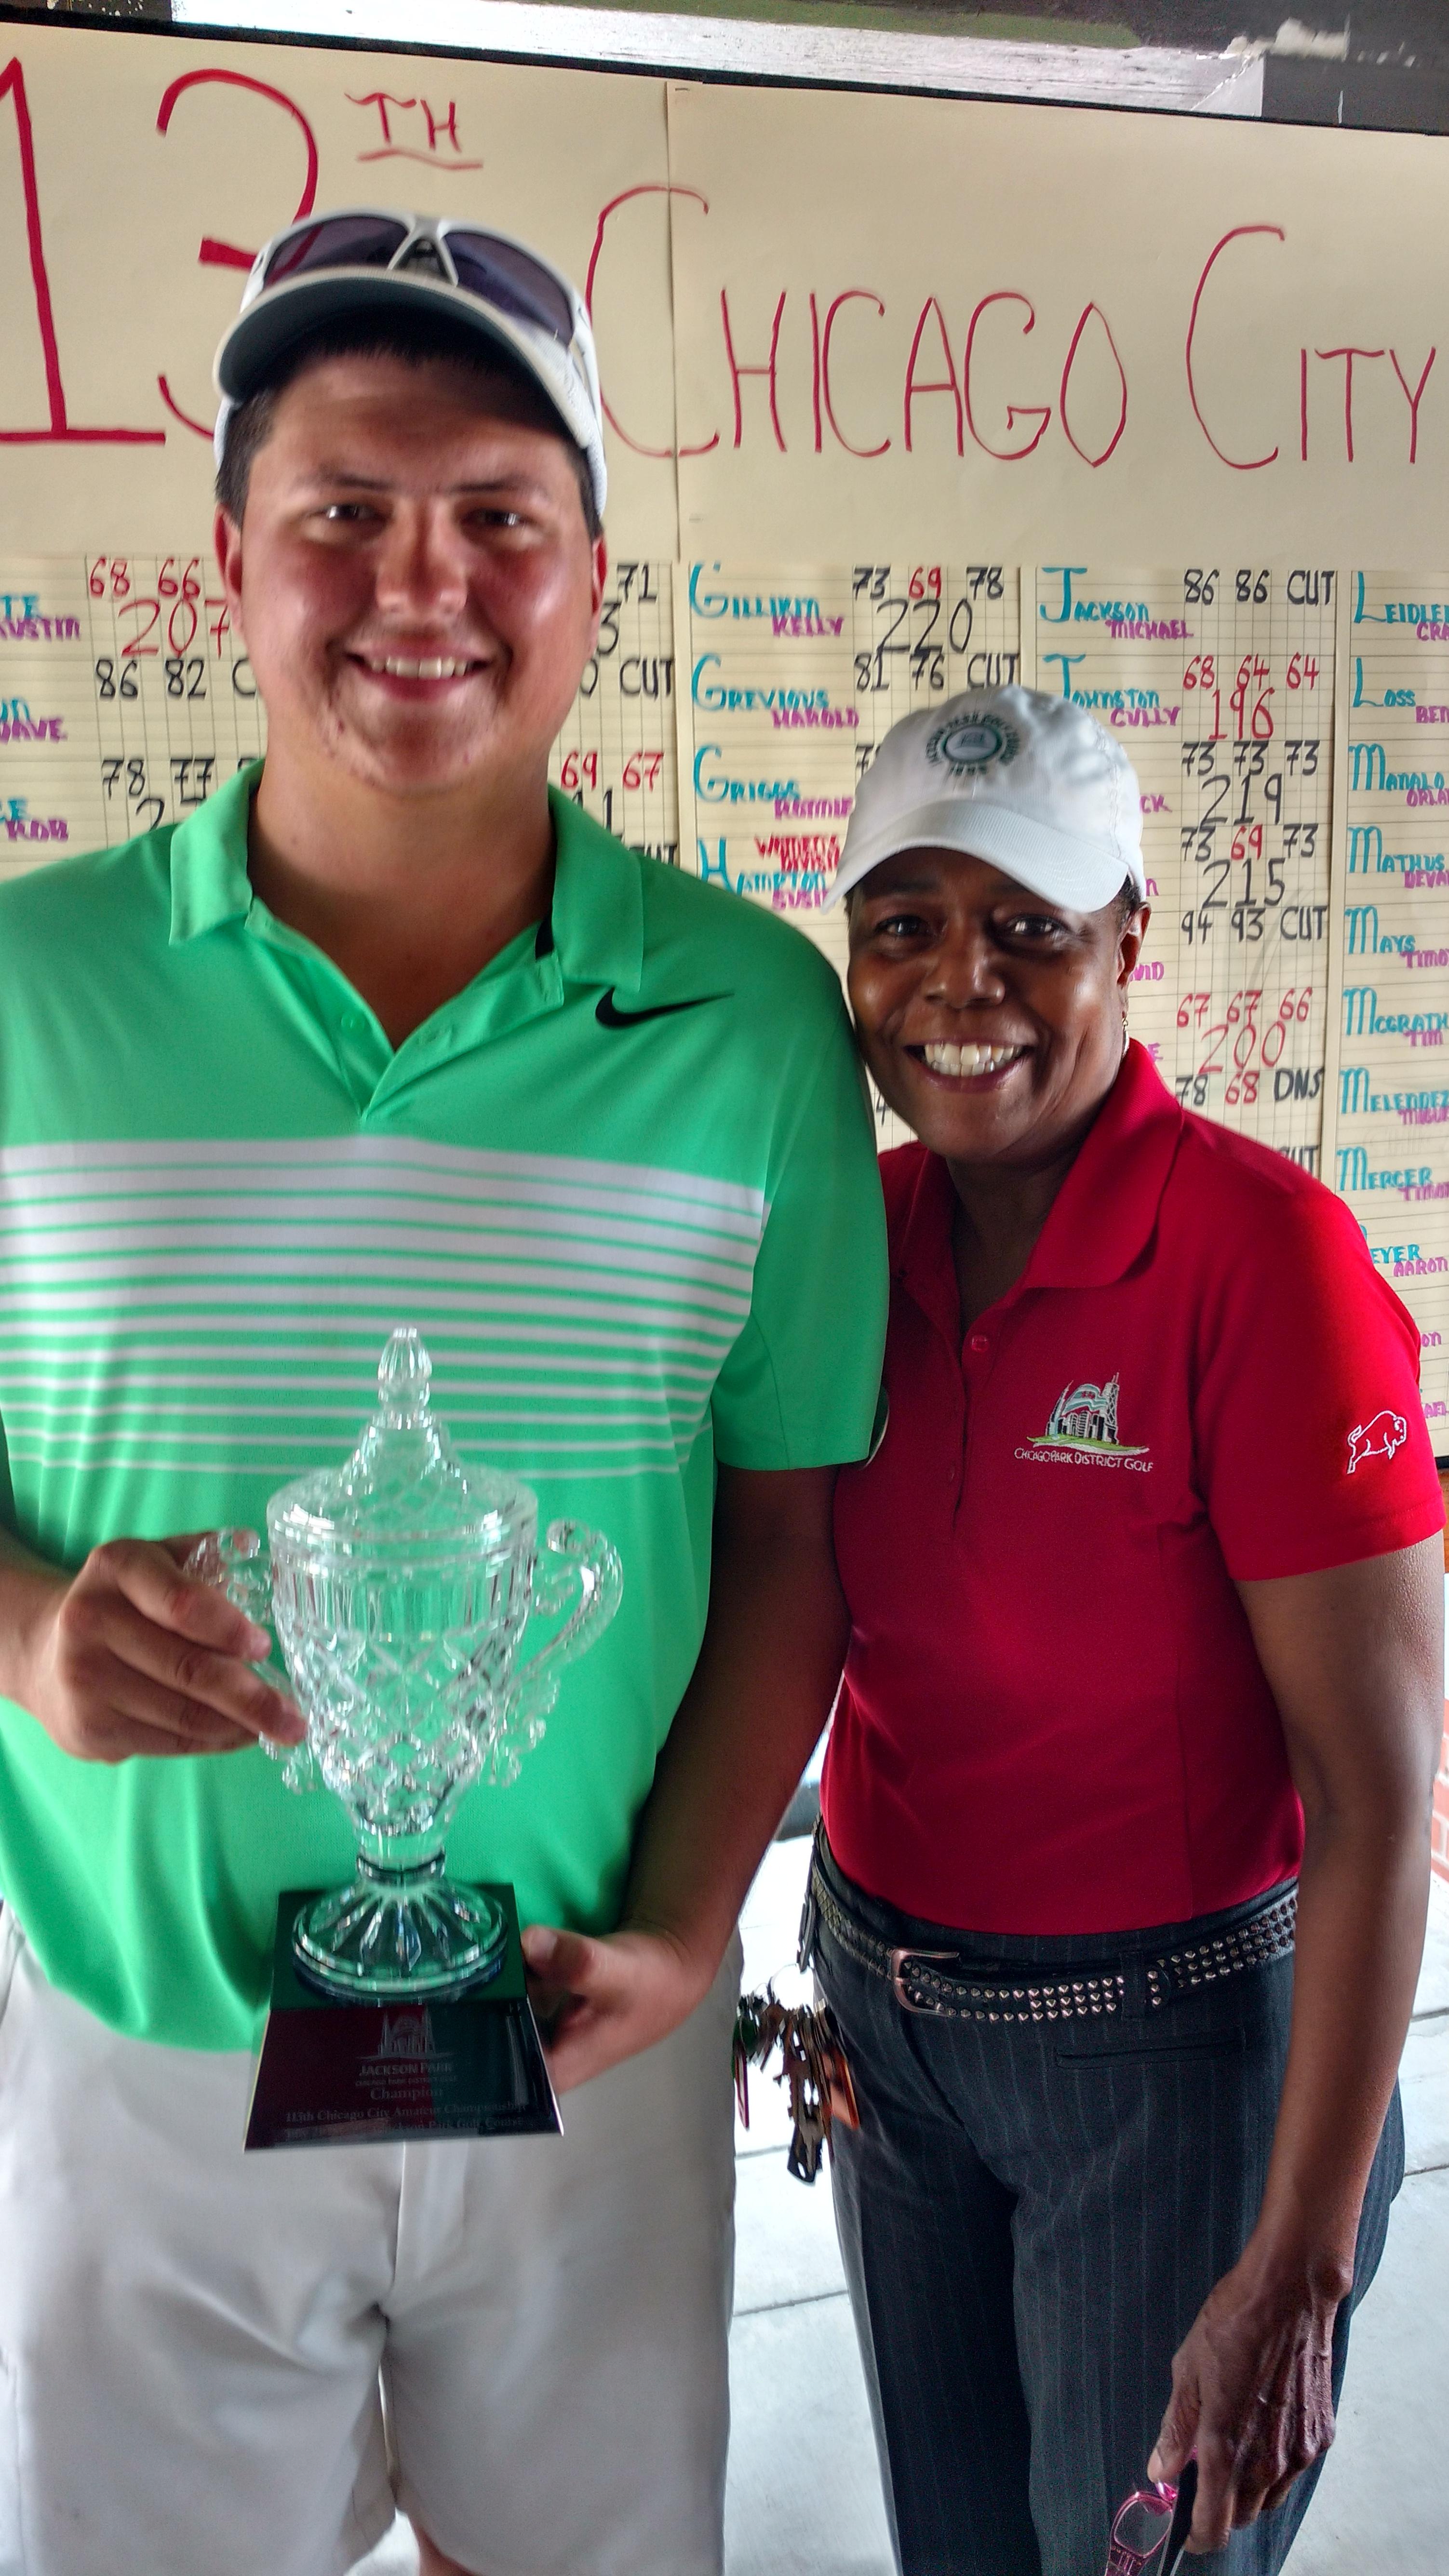 113th Chicago Amateur Winner Blaine Buente